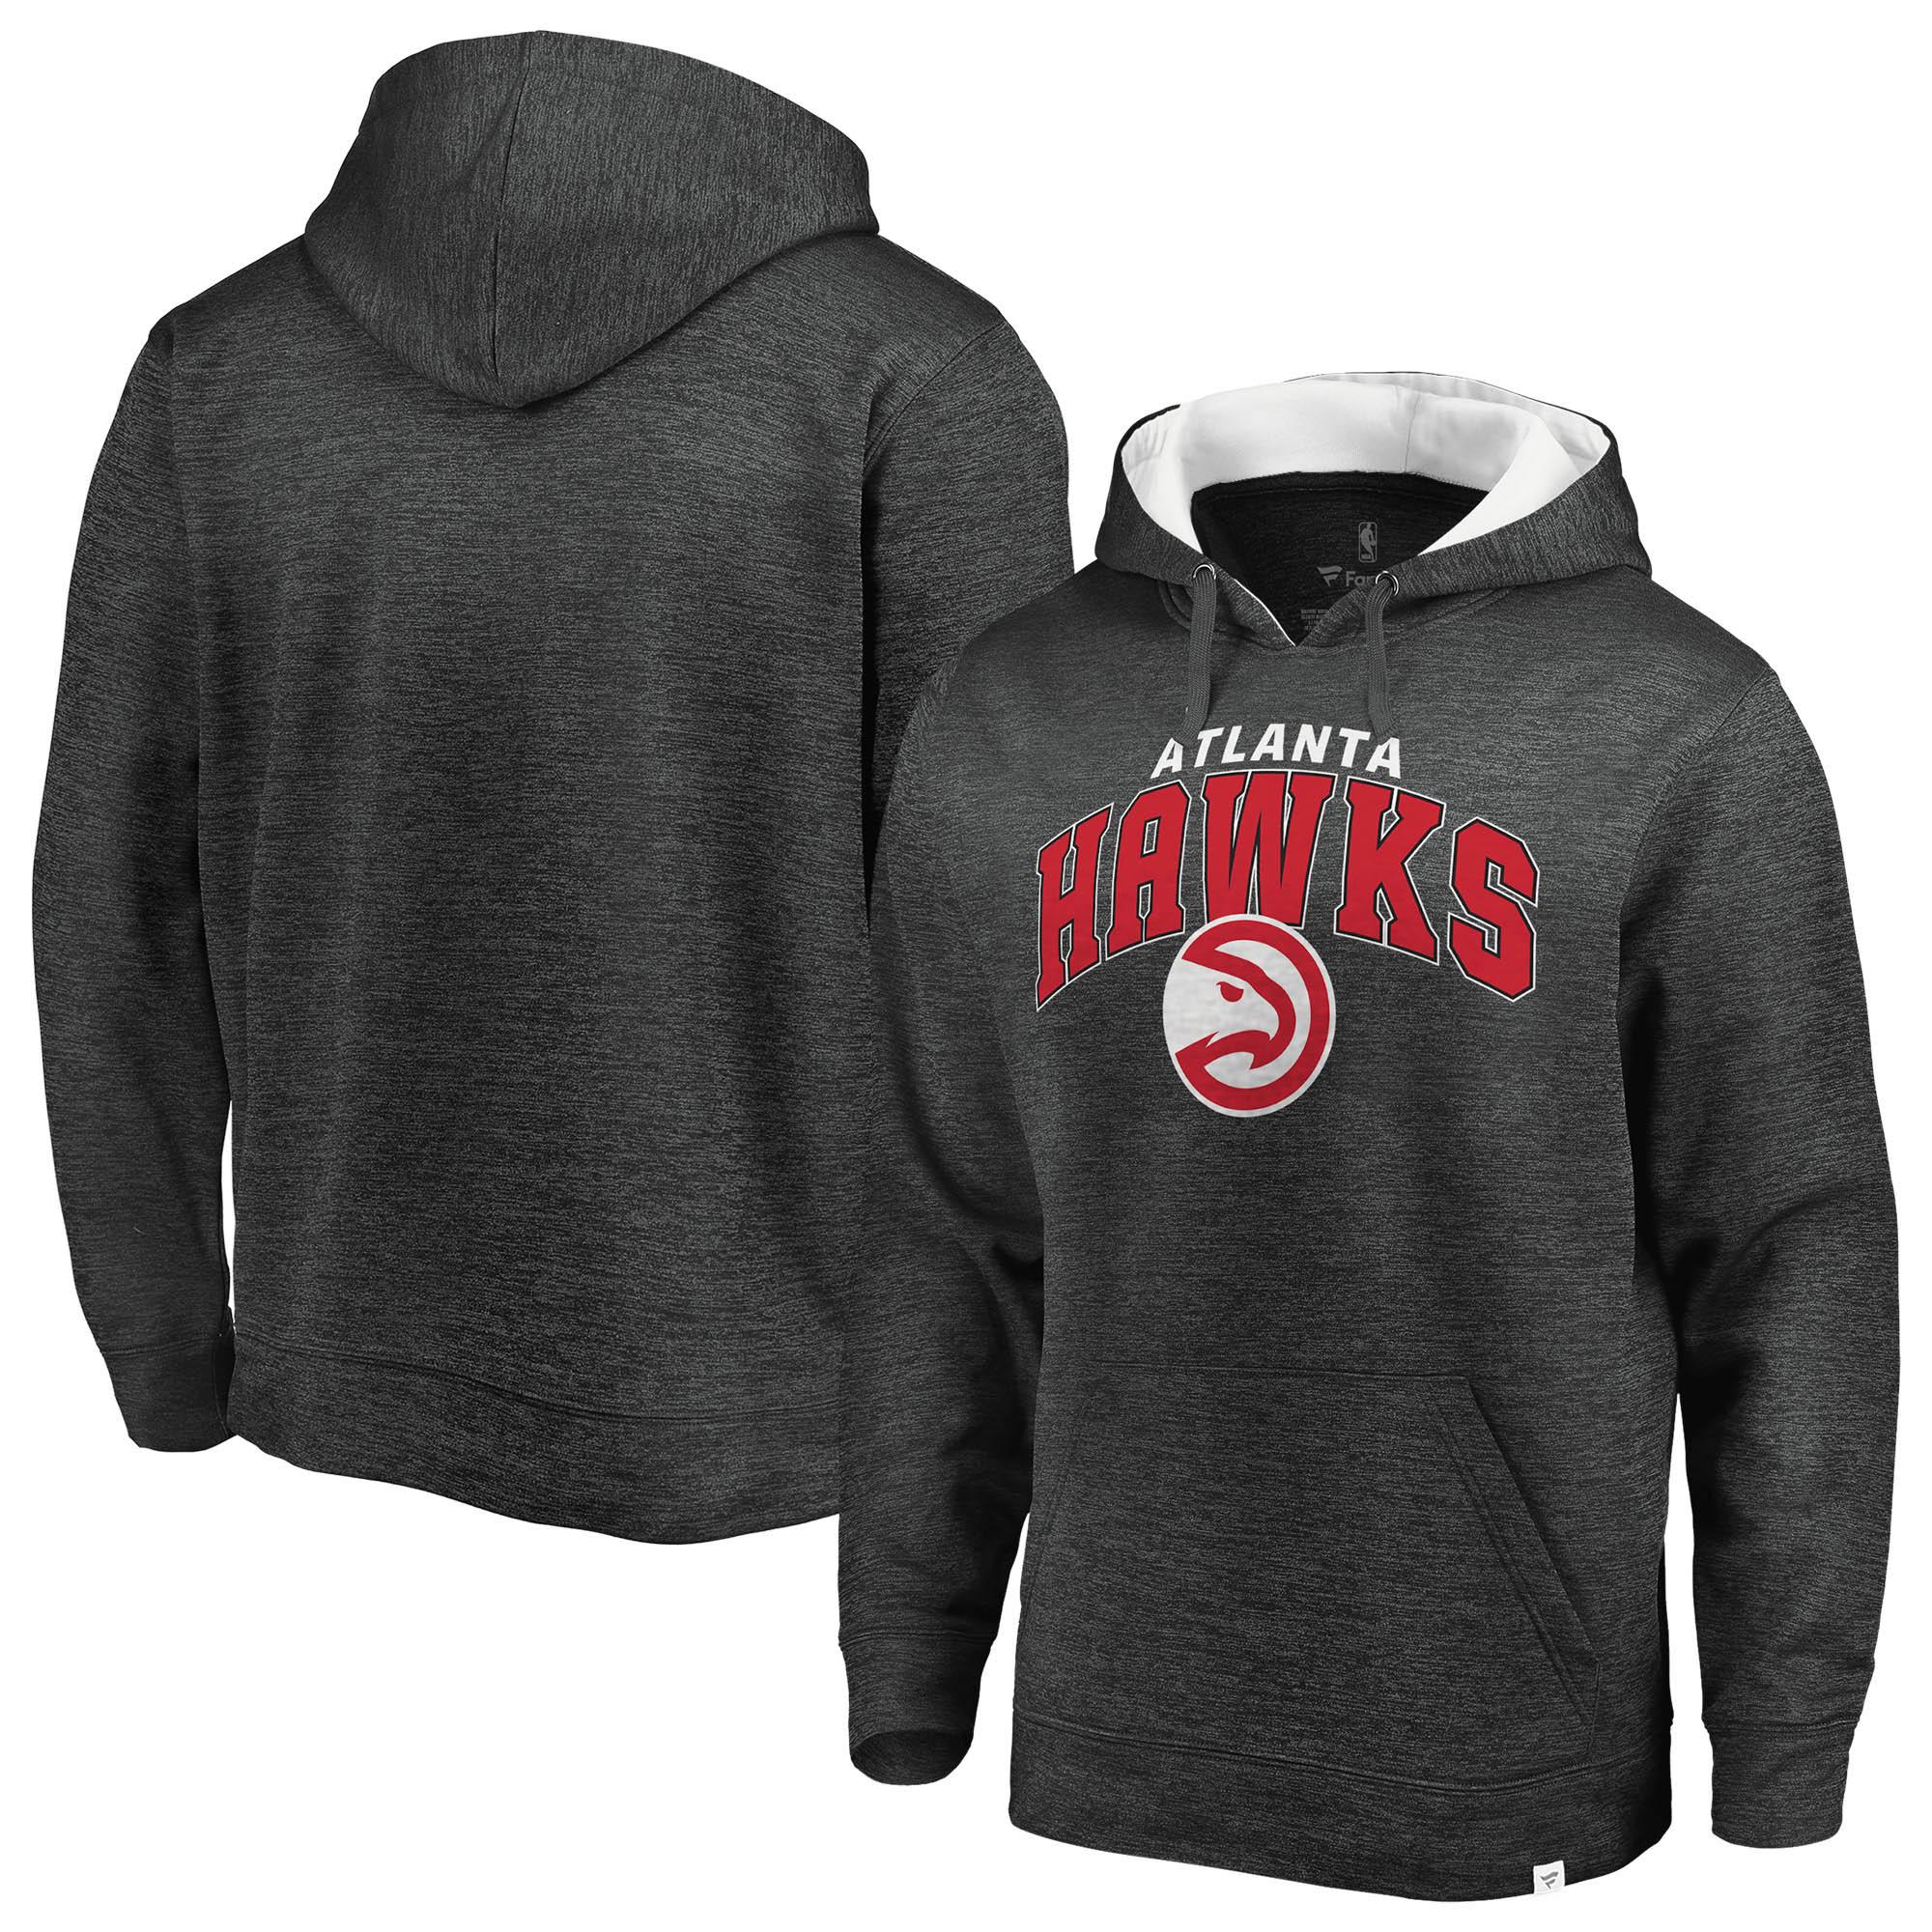 Atlanta Hawks Fanatics Branded Big & Tall Steady Fleece Pullover Hoodie - Gray/White